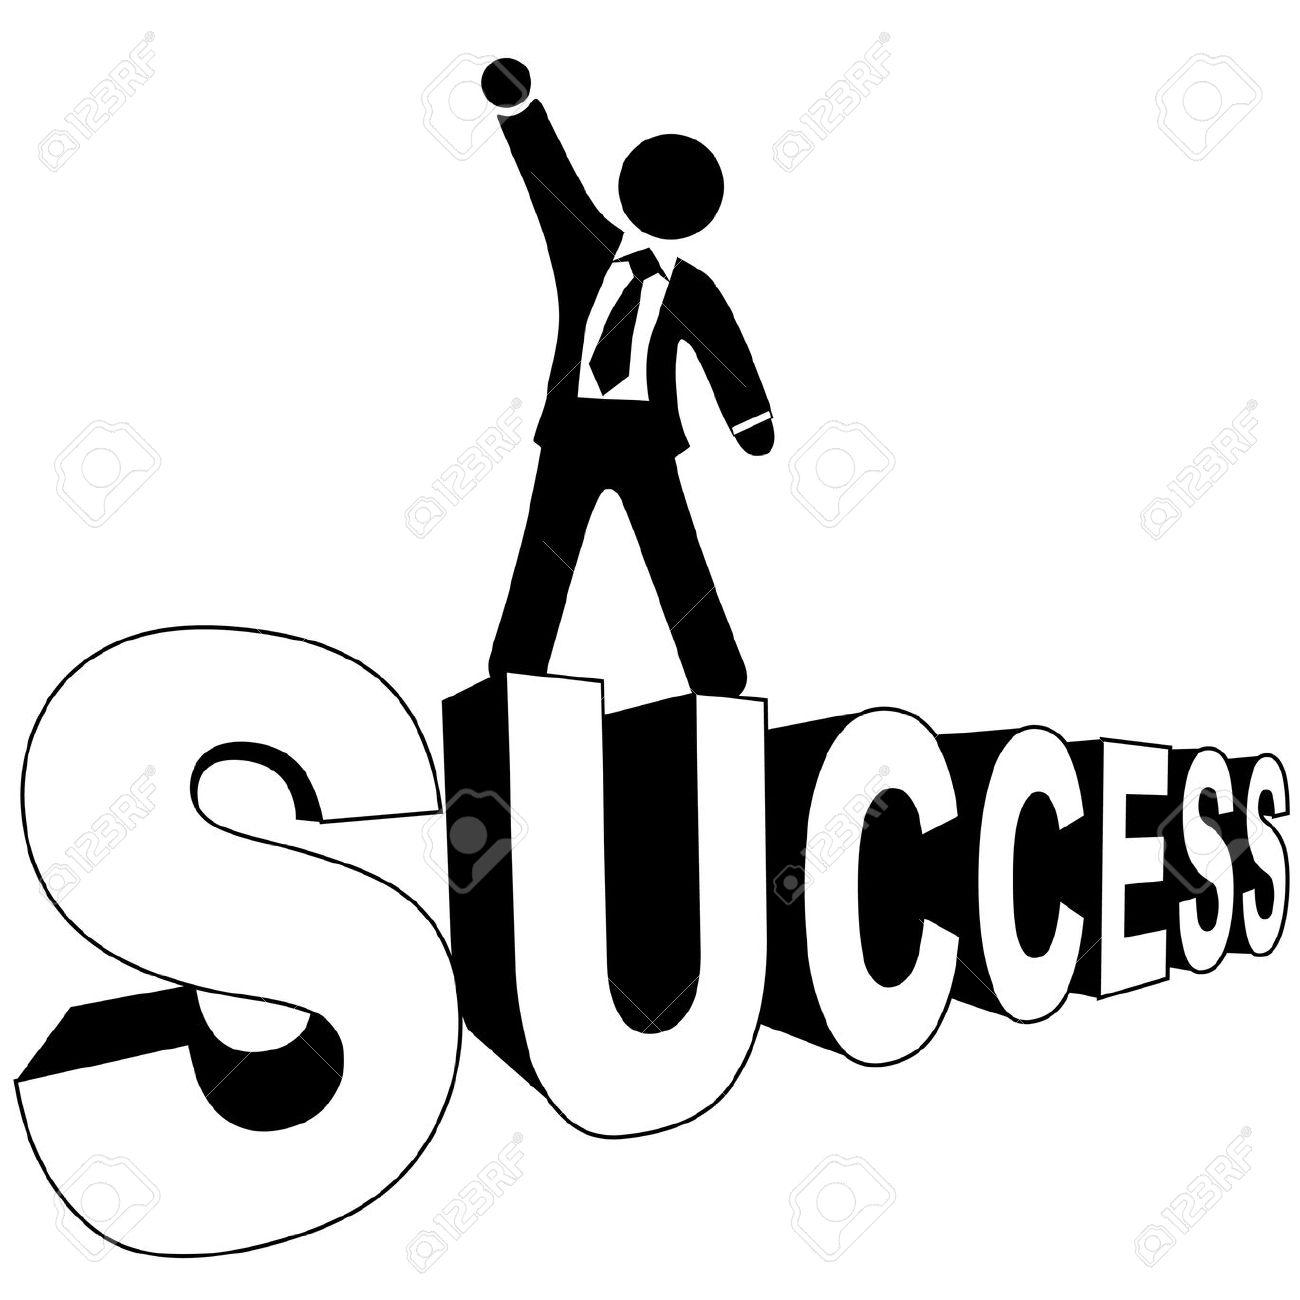 Success logo clipart transparent Success Clipart | Clipart Panda - Free Clipart Images transparent